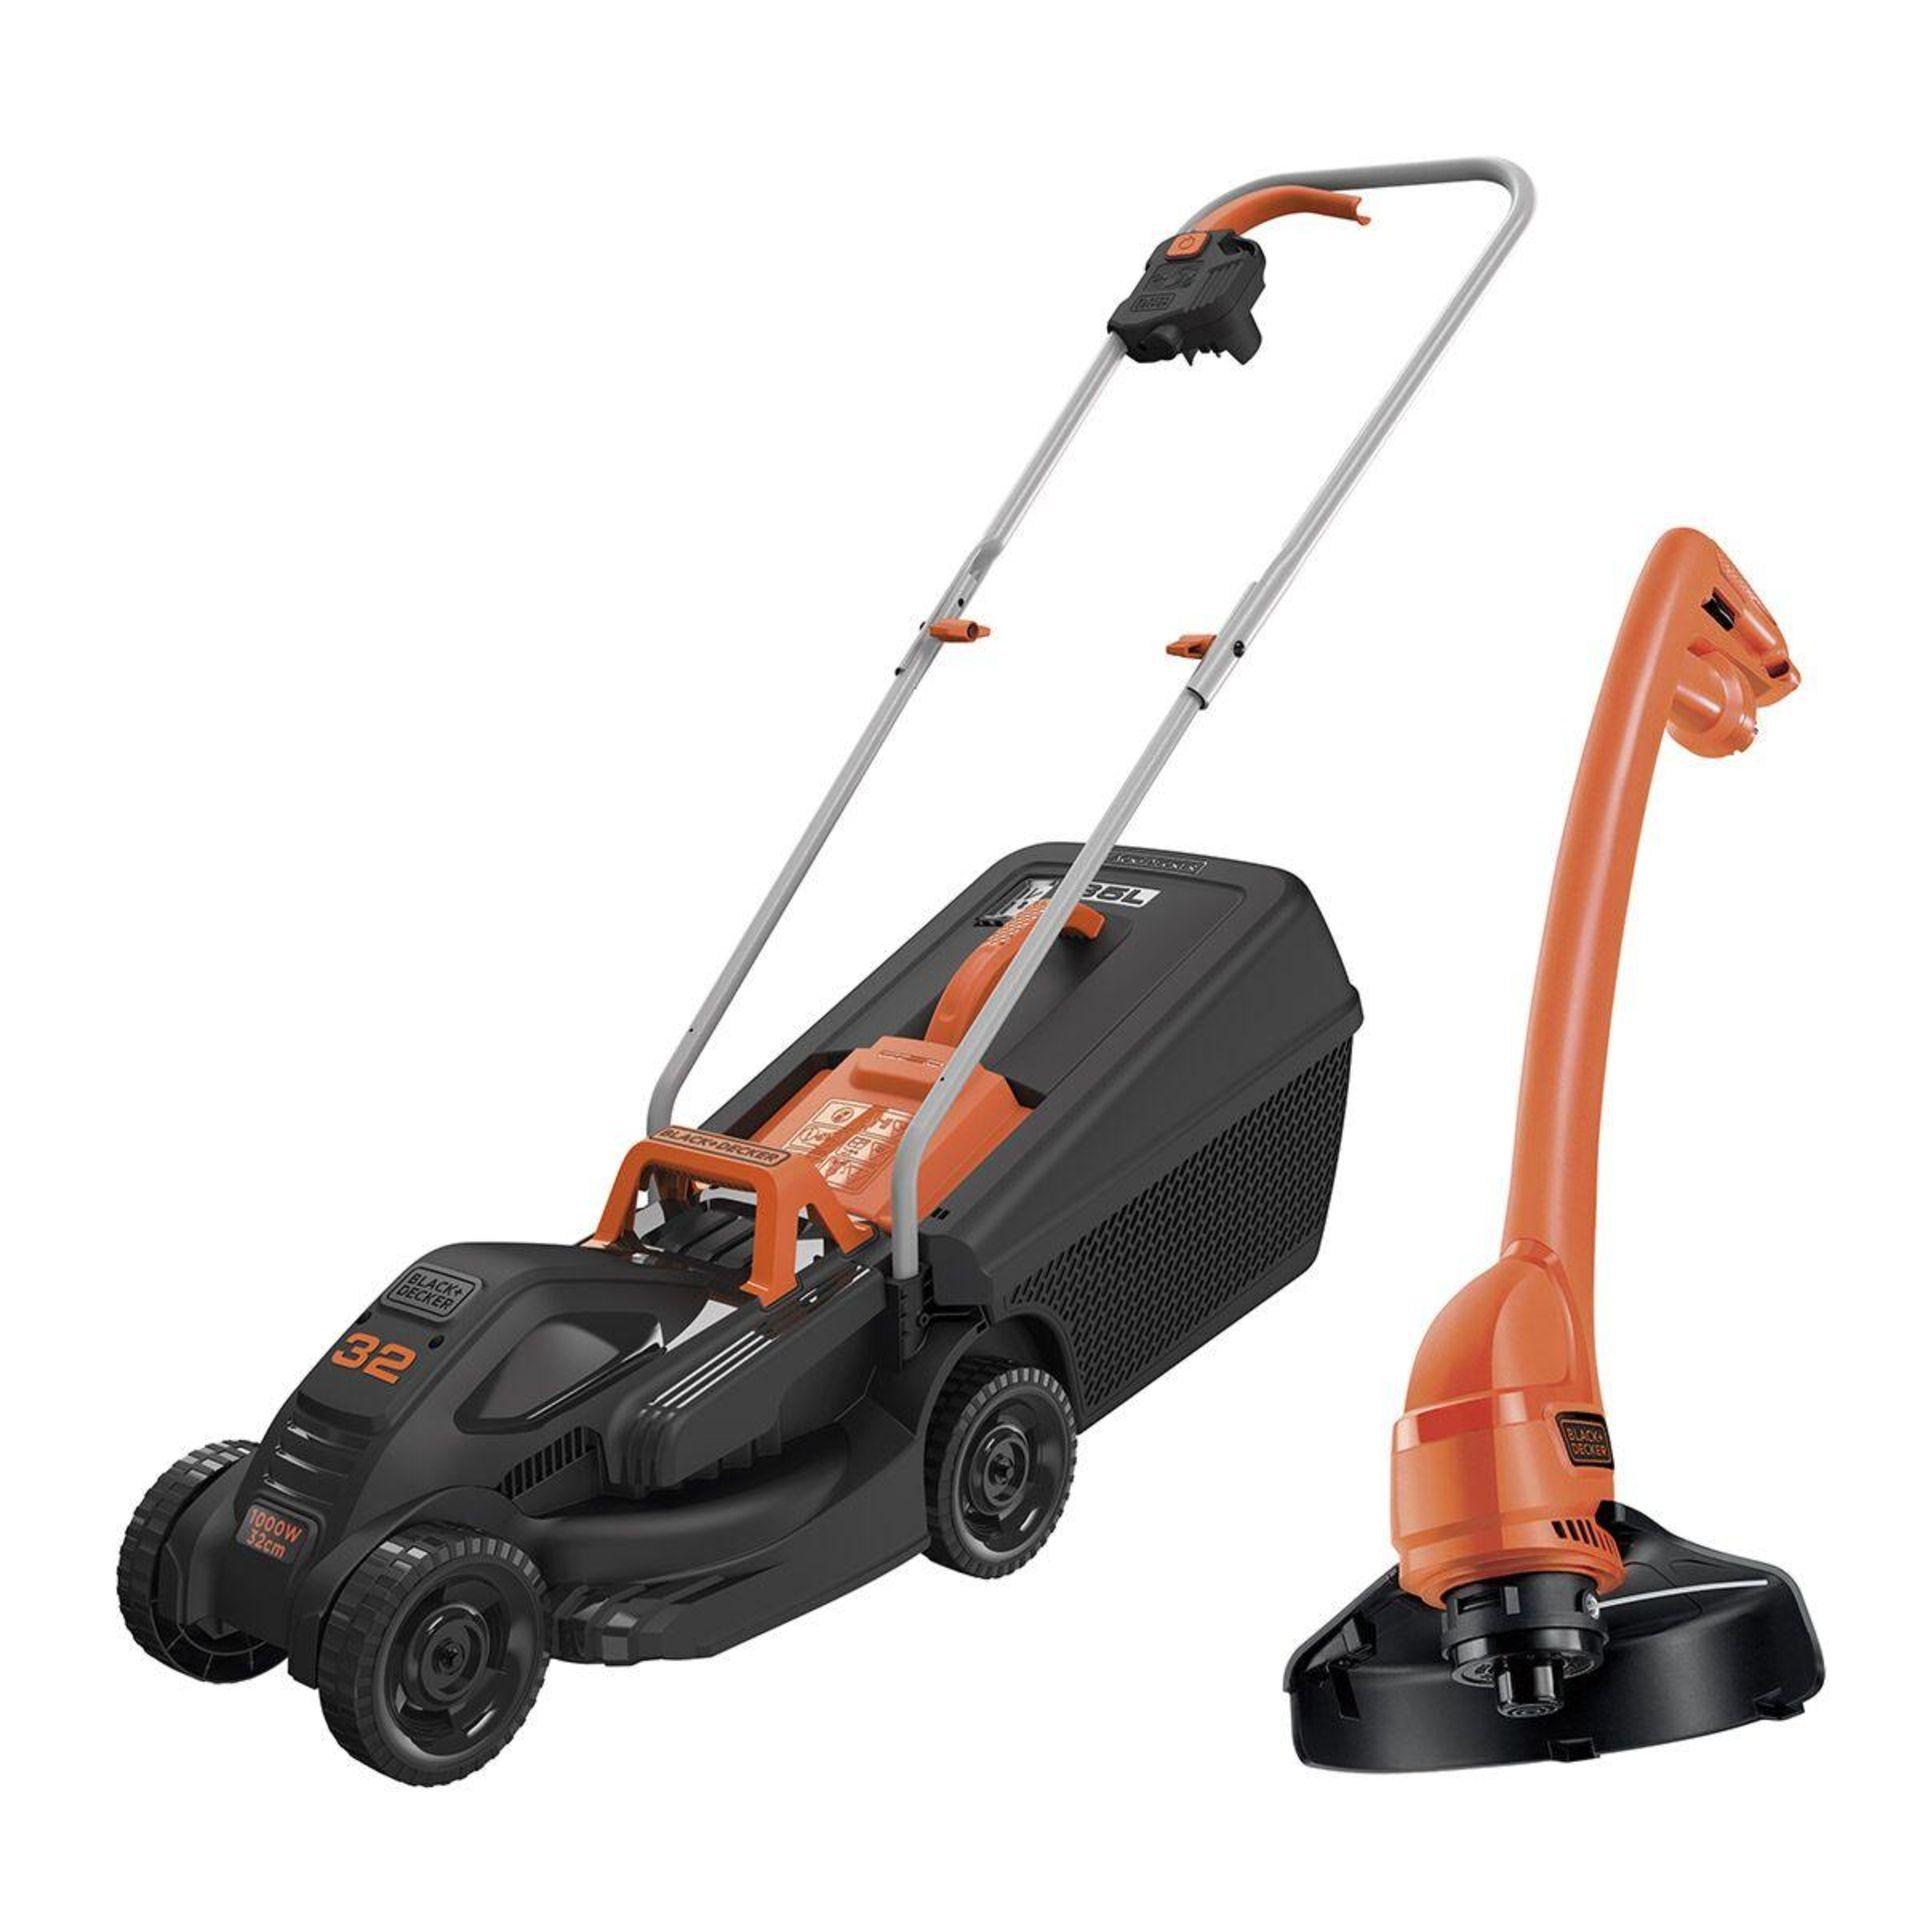 (P7) 1x Black & Decker 32cm 1000W 10m Corded Lawn Mower & Strimmer RRP £99. New, Sealed Item.